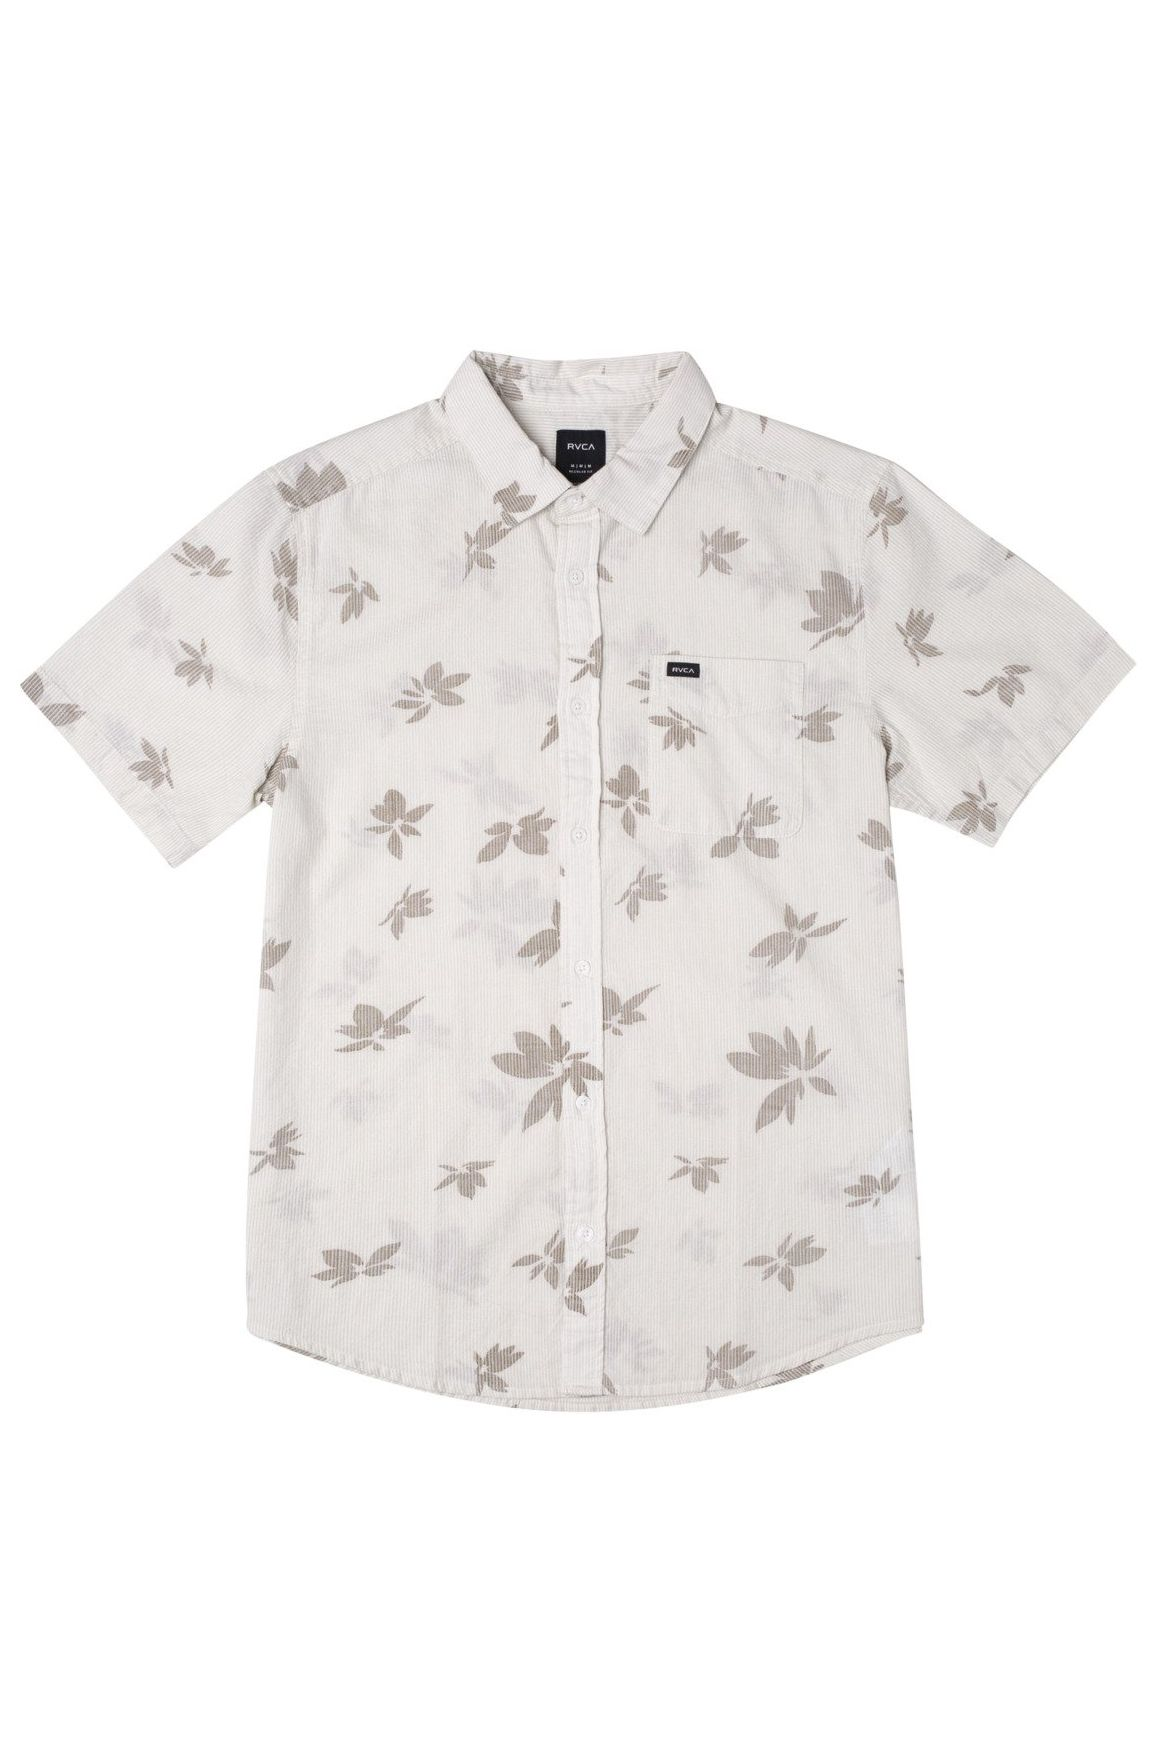 Camisa RVCA ENDLESS SEERSUCKER P Antique White